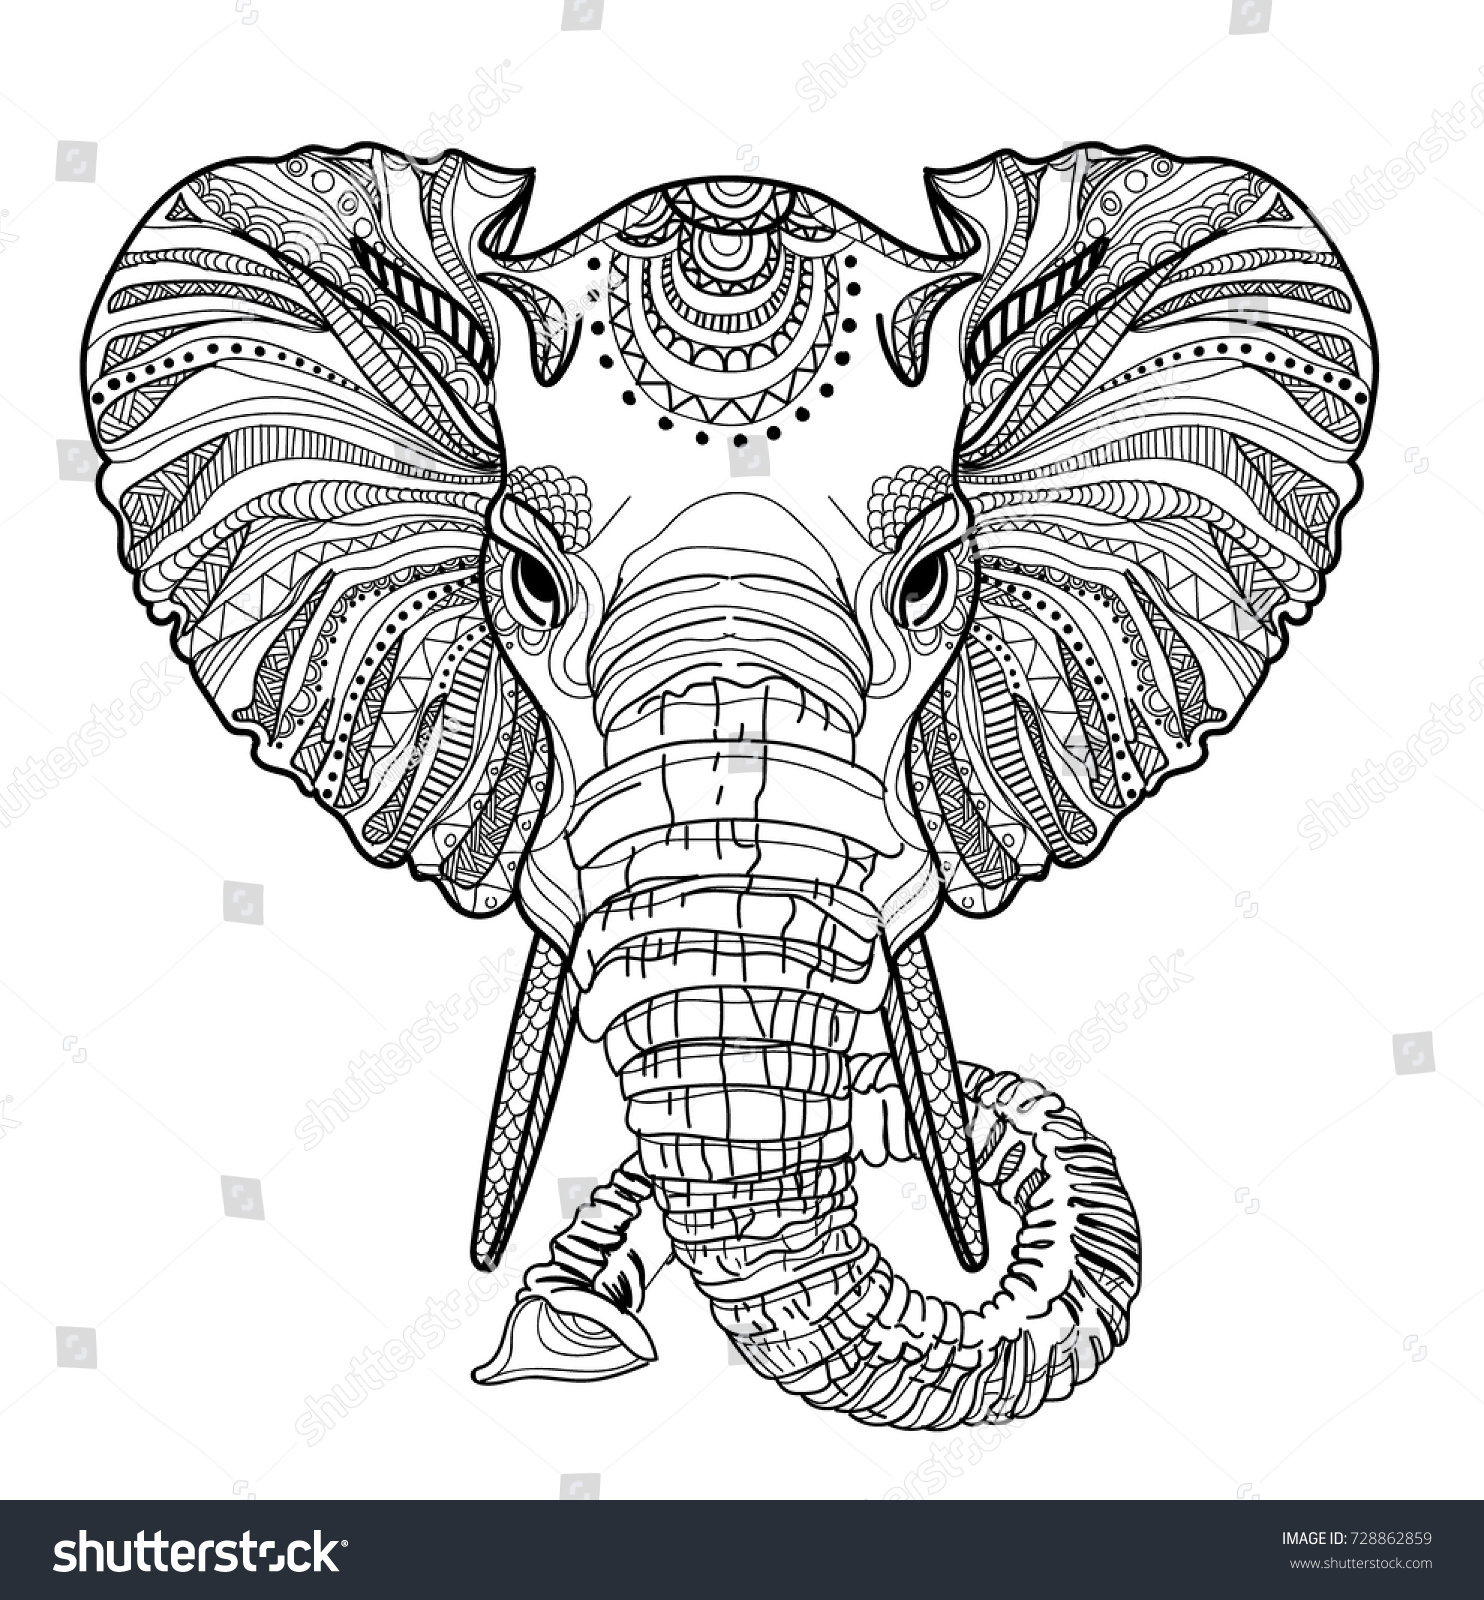 Head Elephant Meditation Coloring Mandala Large Stock Vector ...